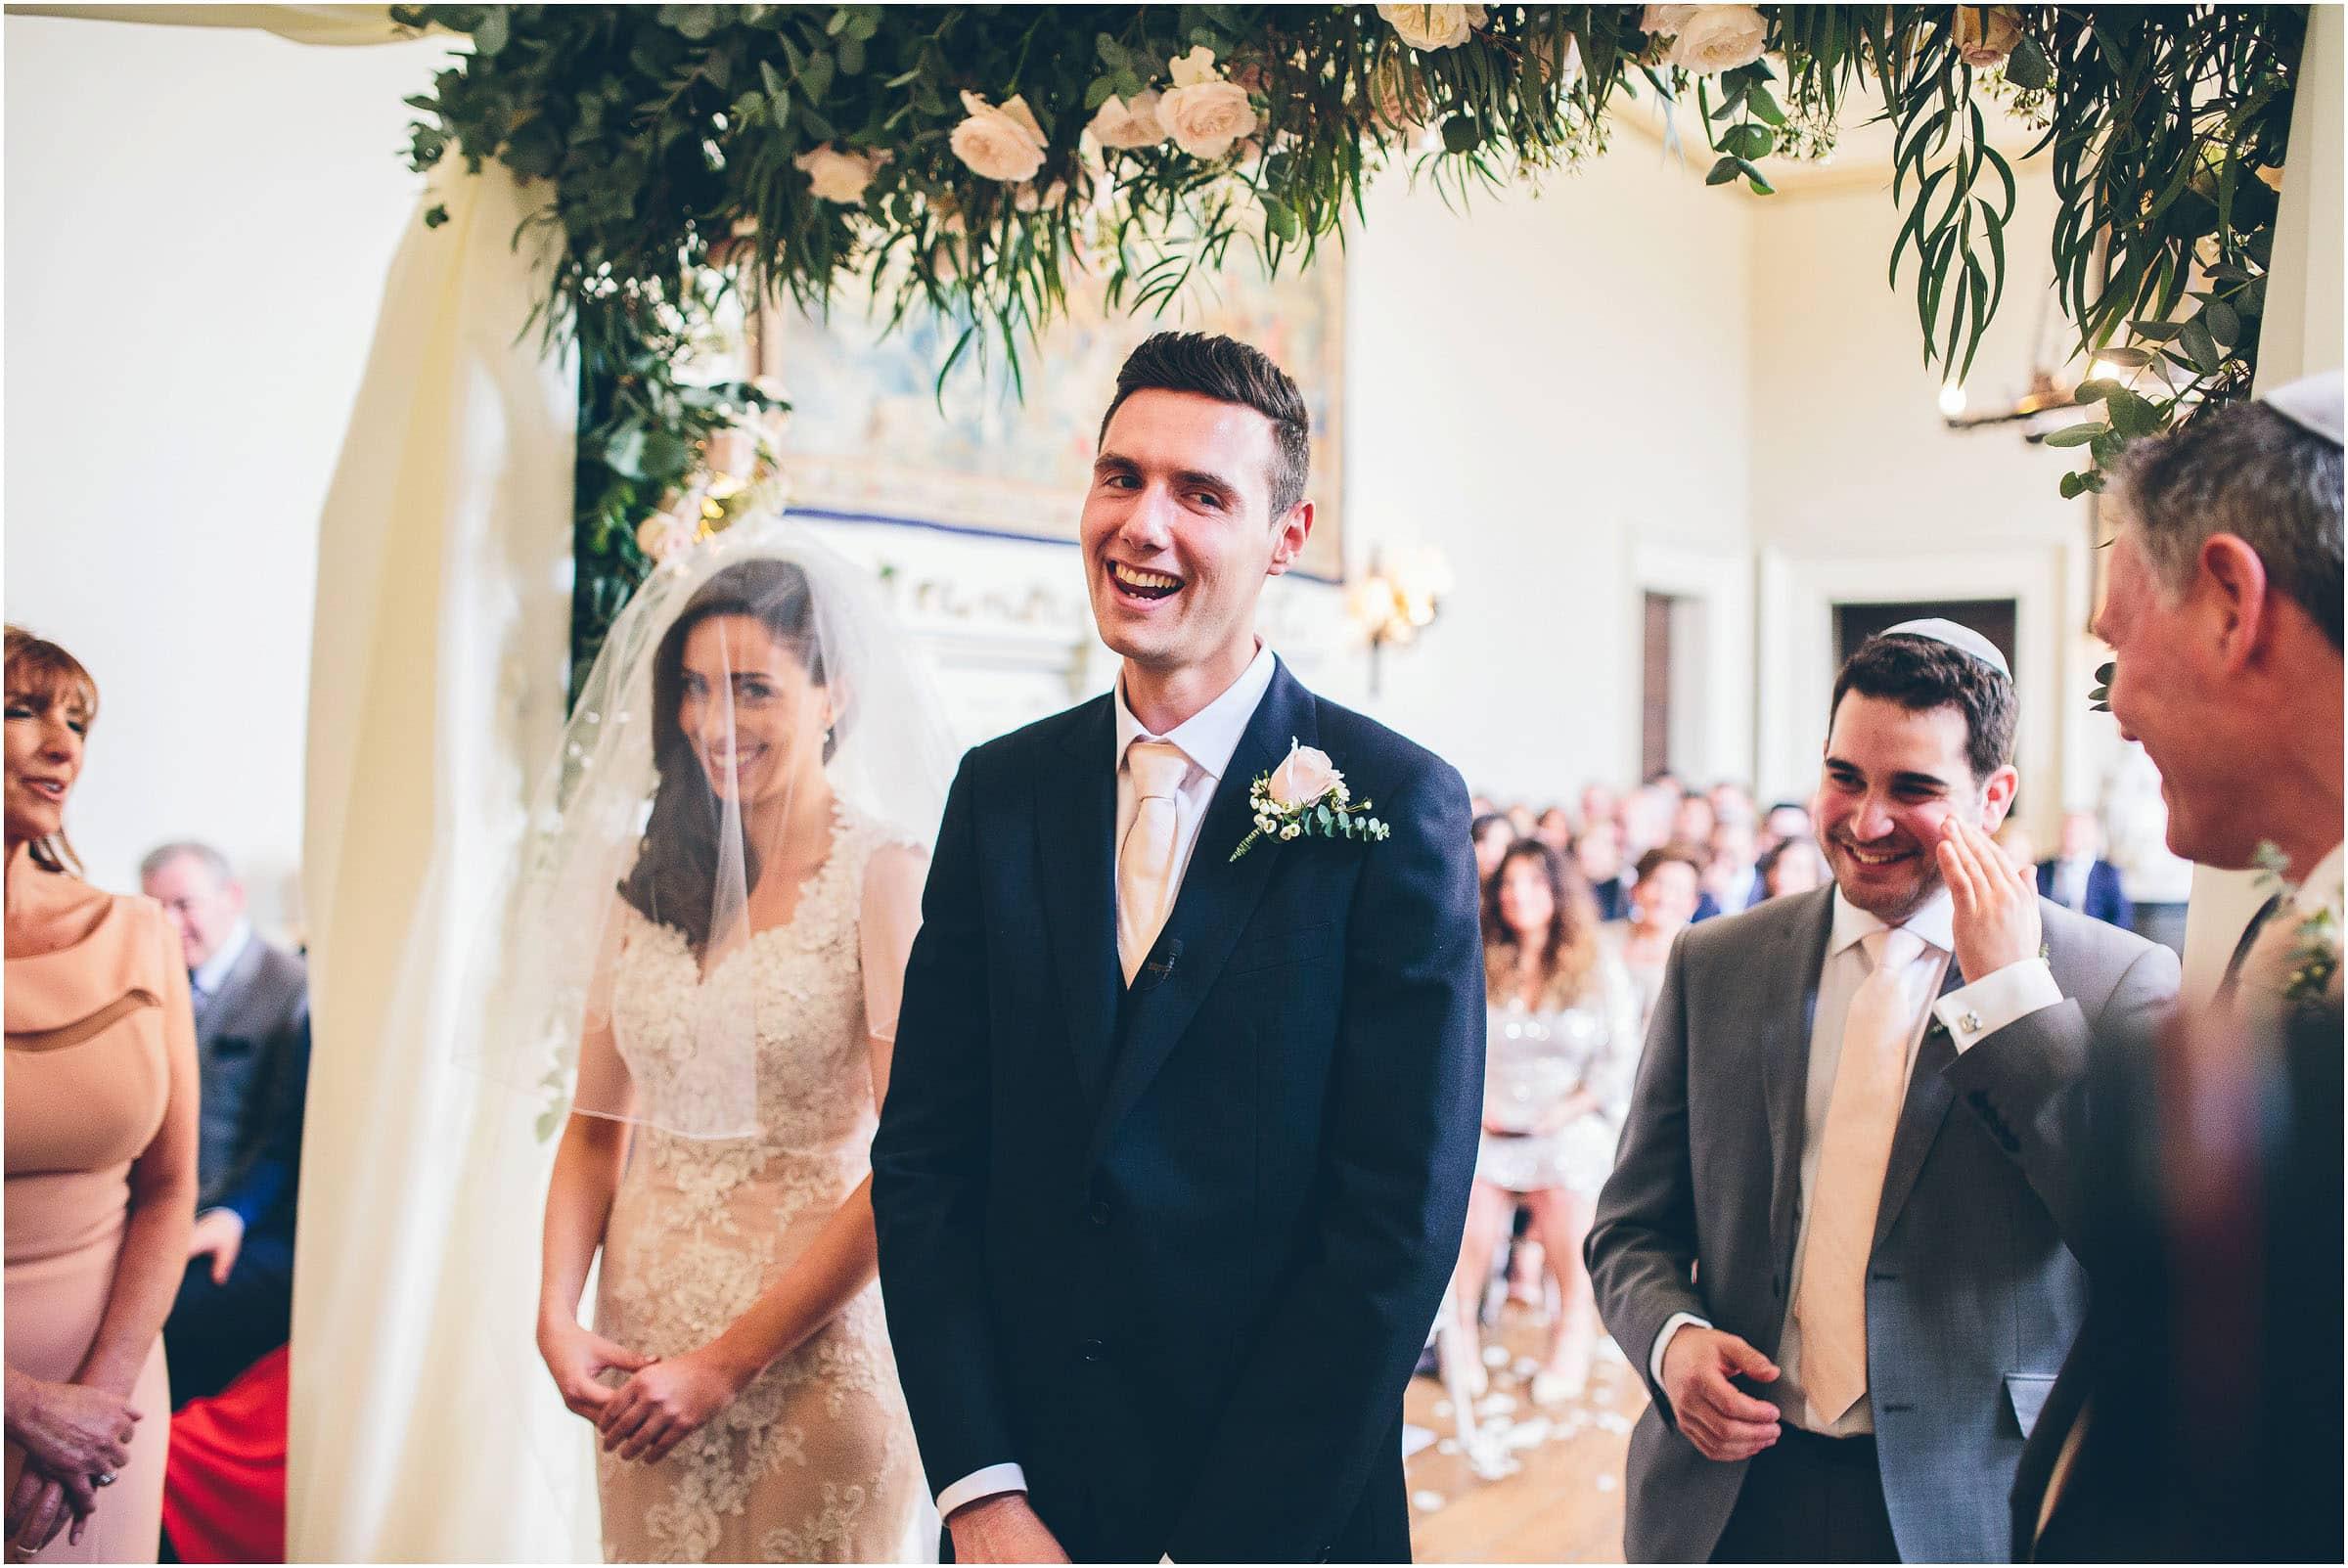 Elmore_Court_Wedding_Photography_0050